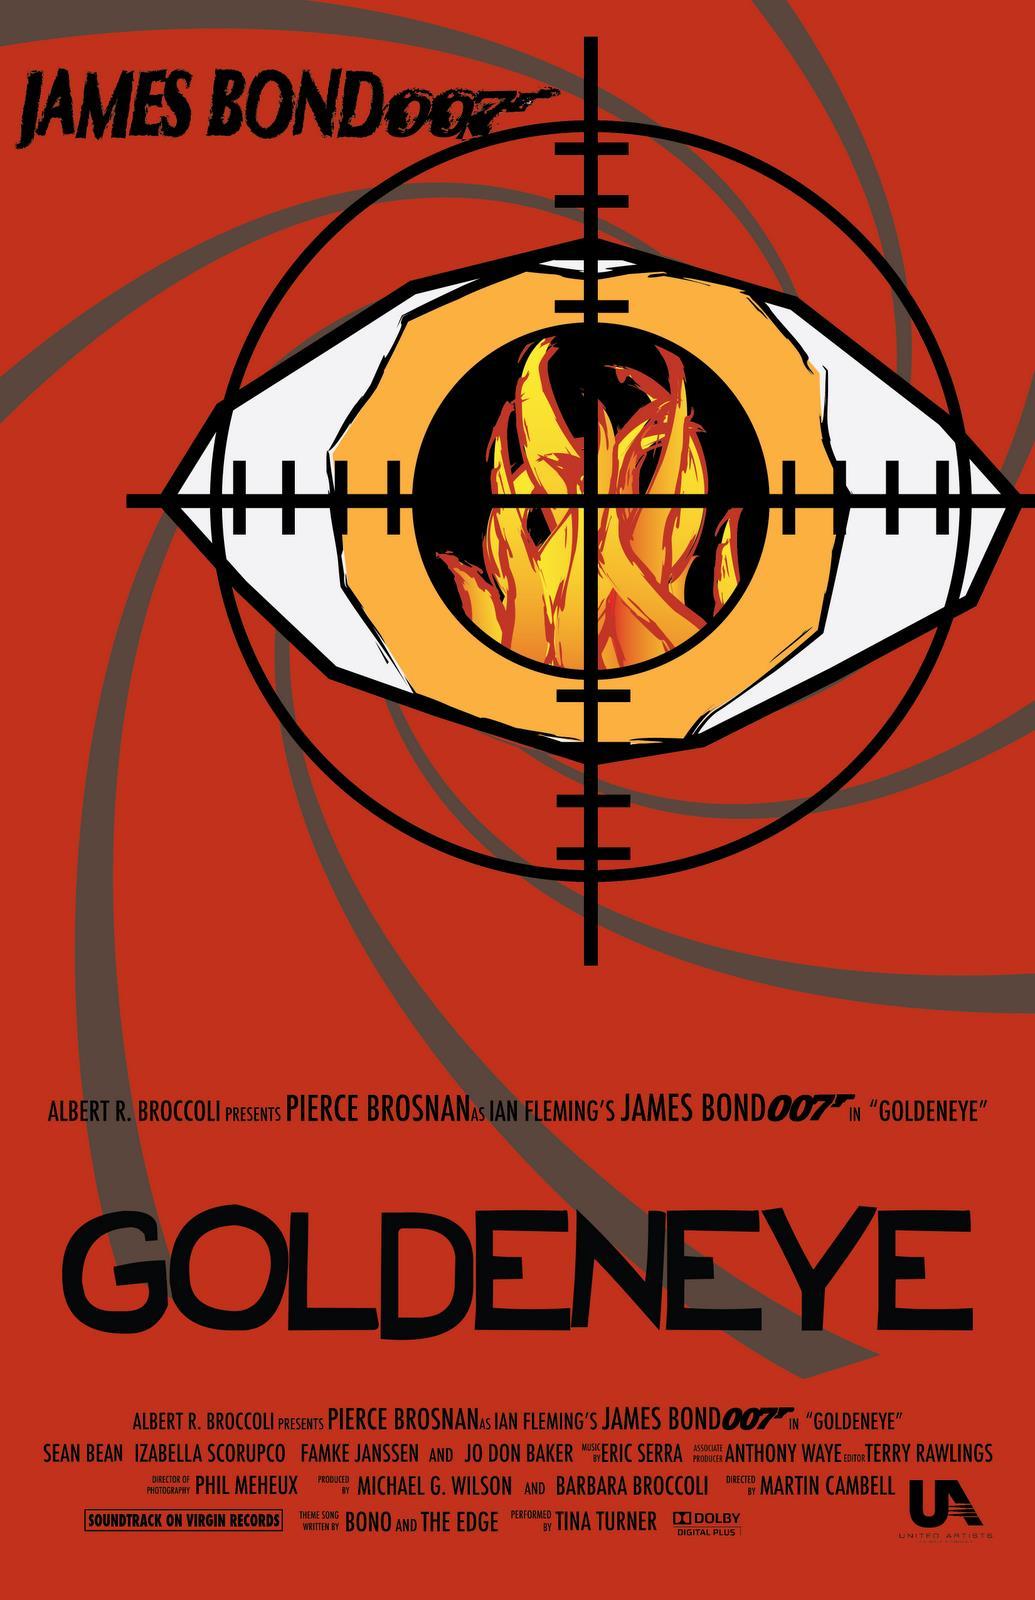 Amazing James Bond Movie Poster Art Target